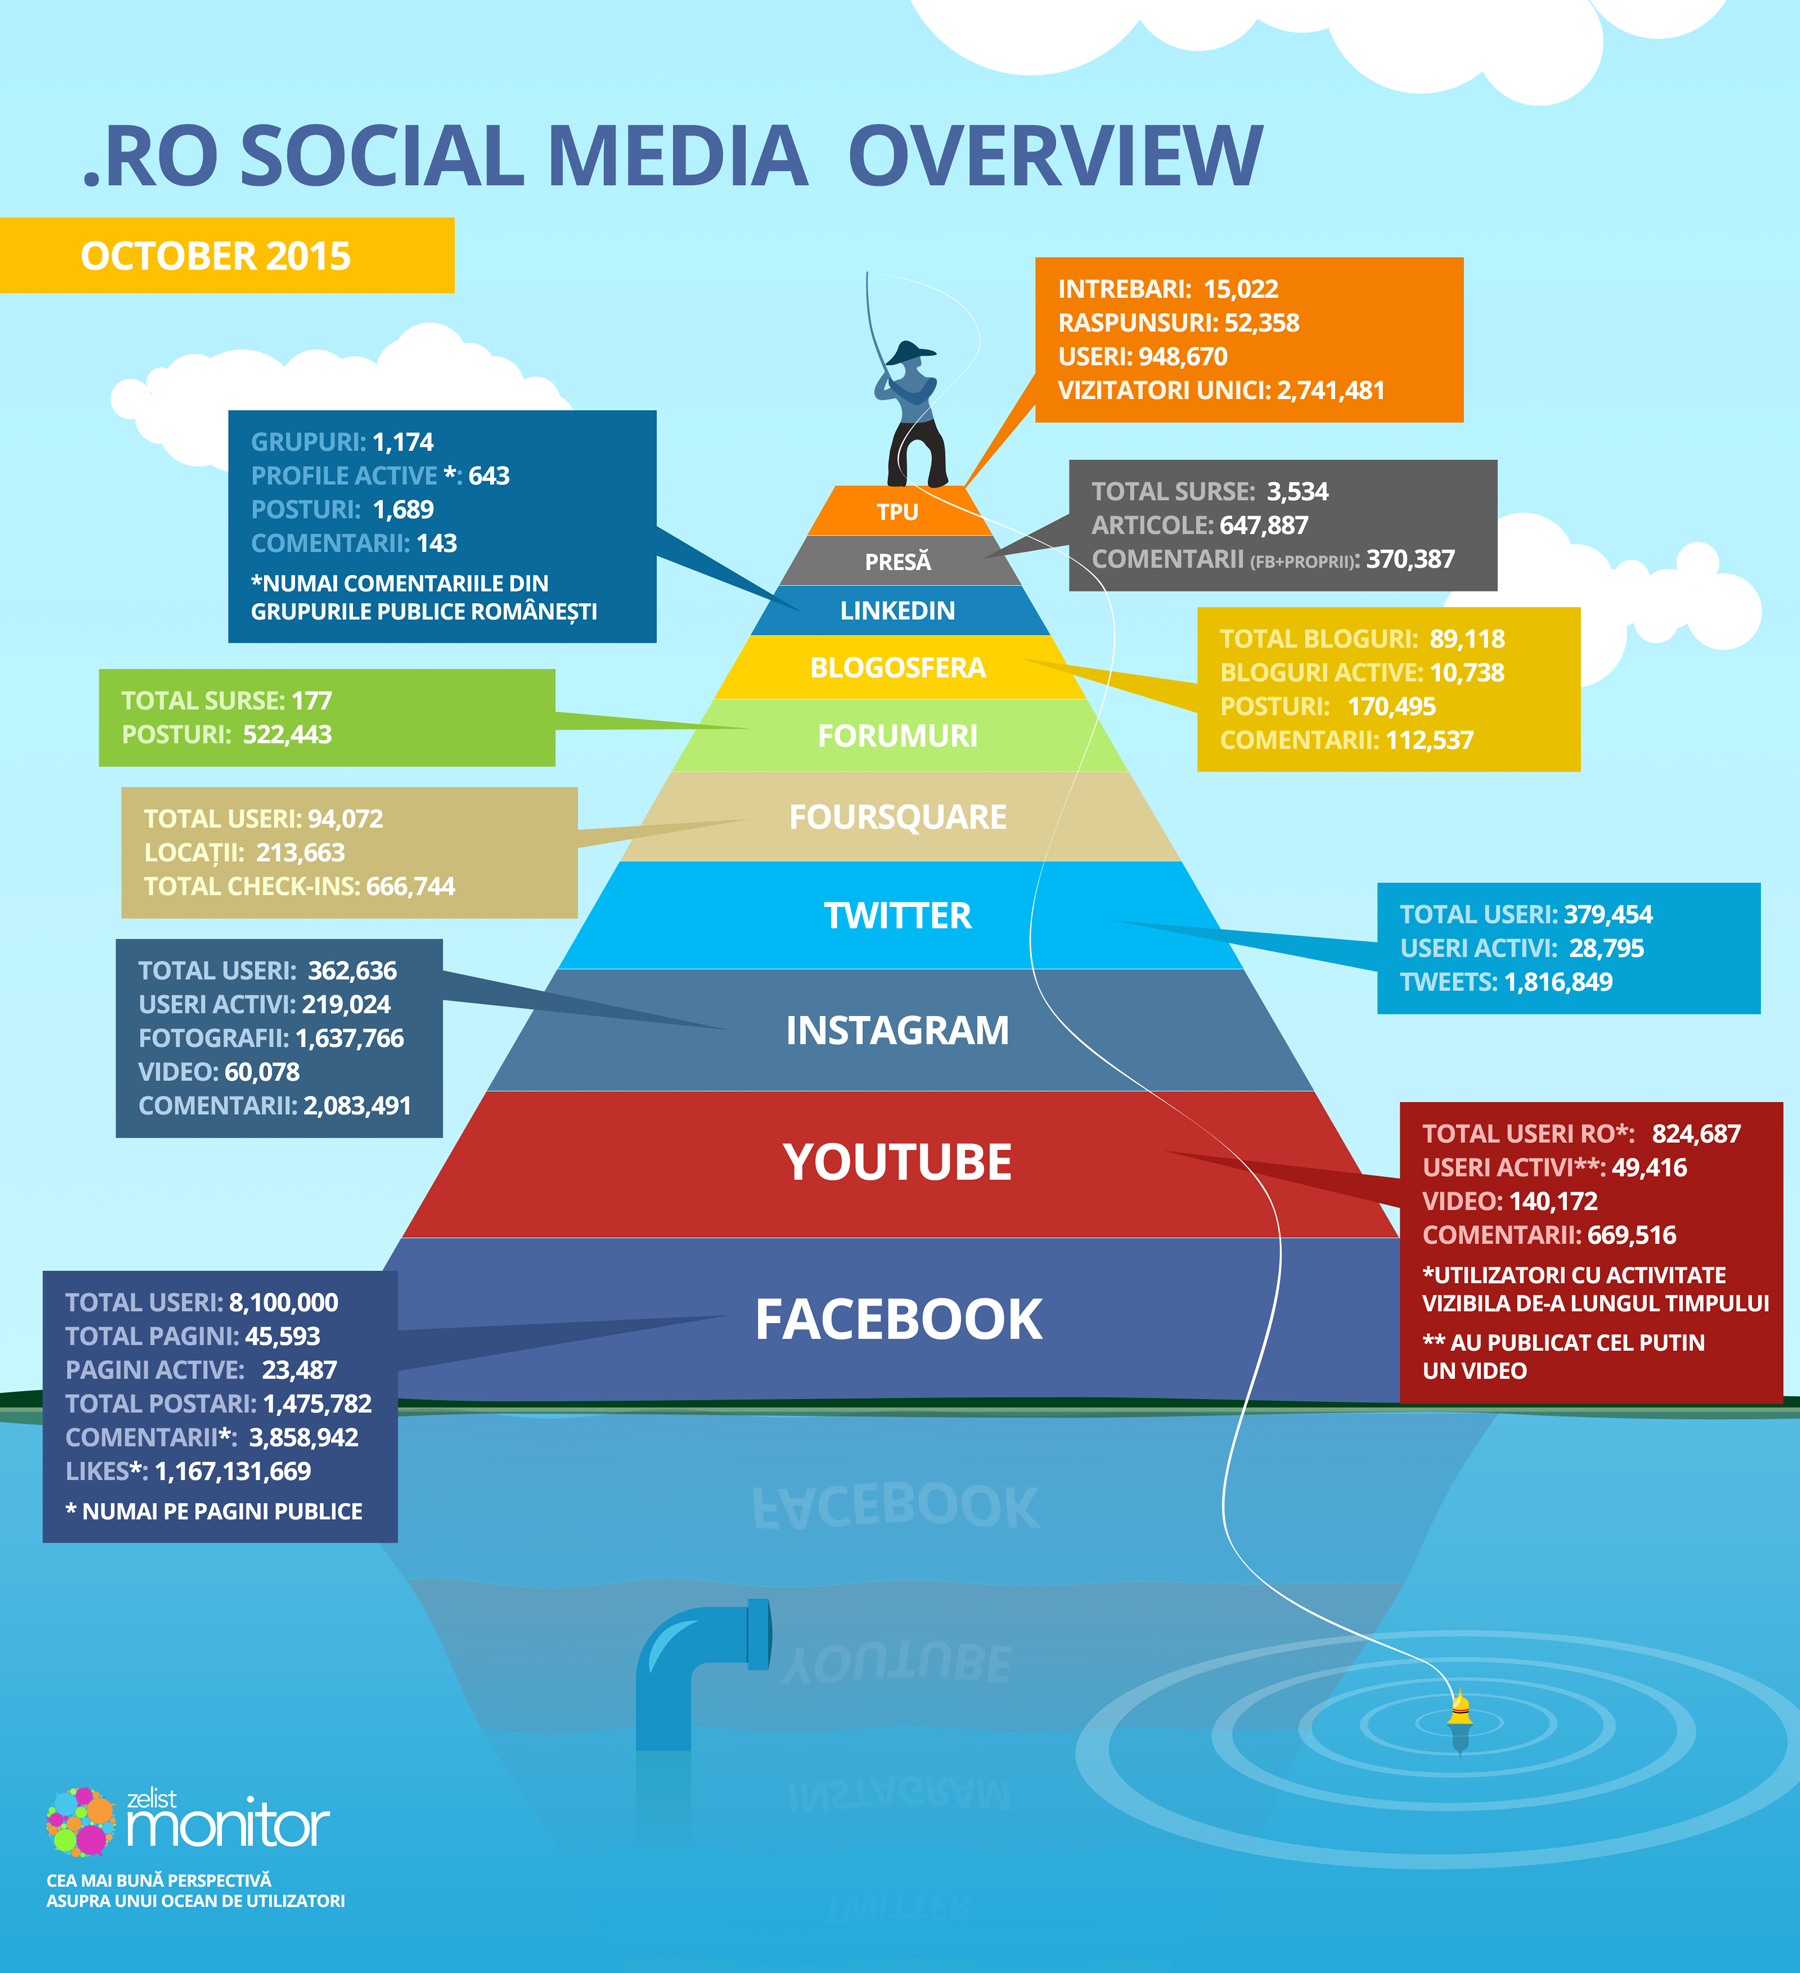 infographic_piramida_october_2015